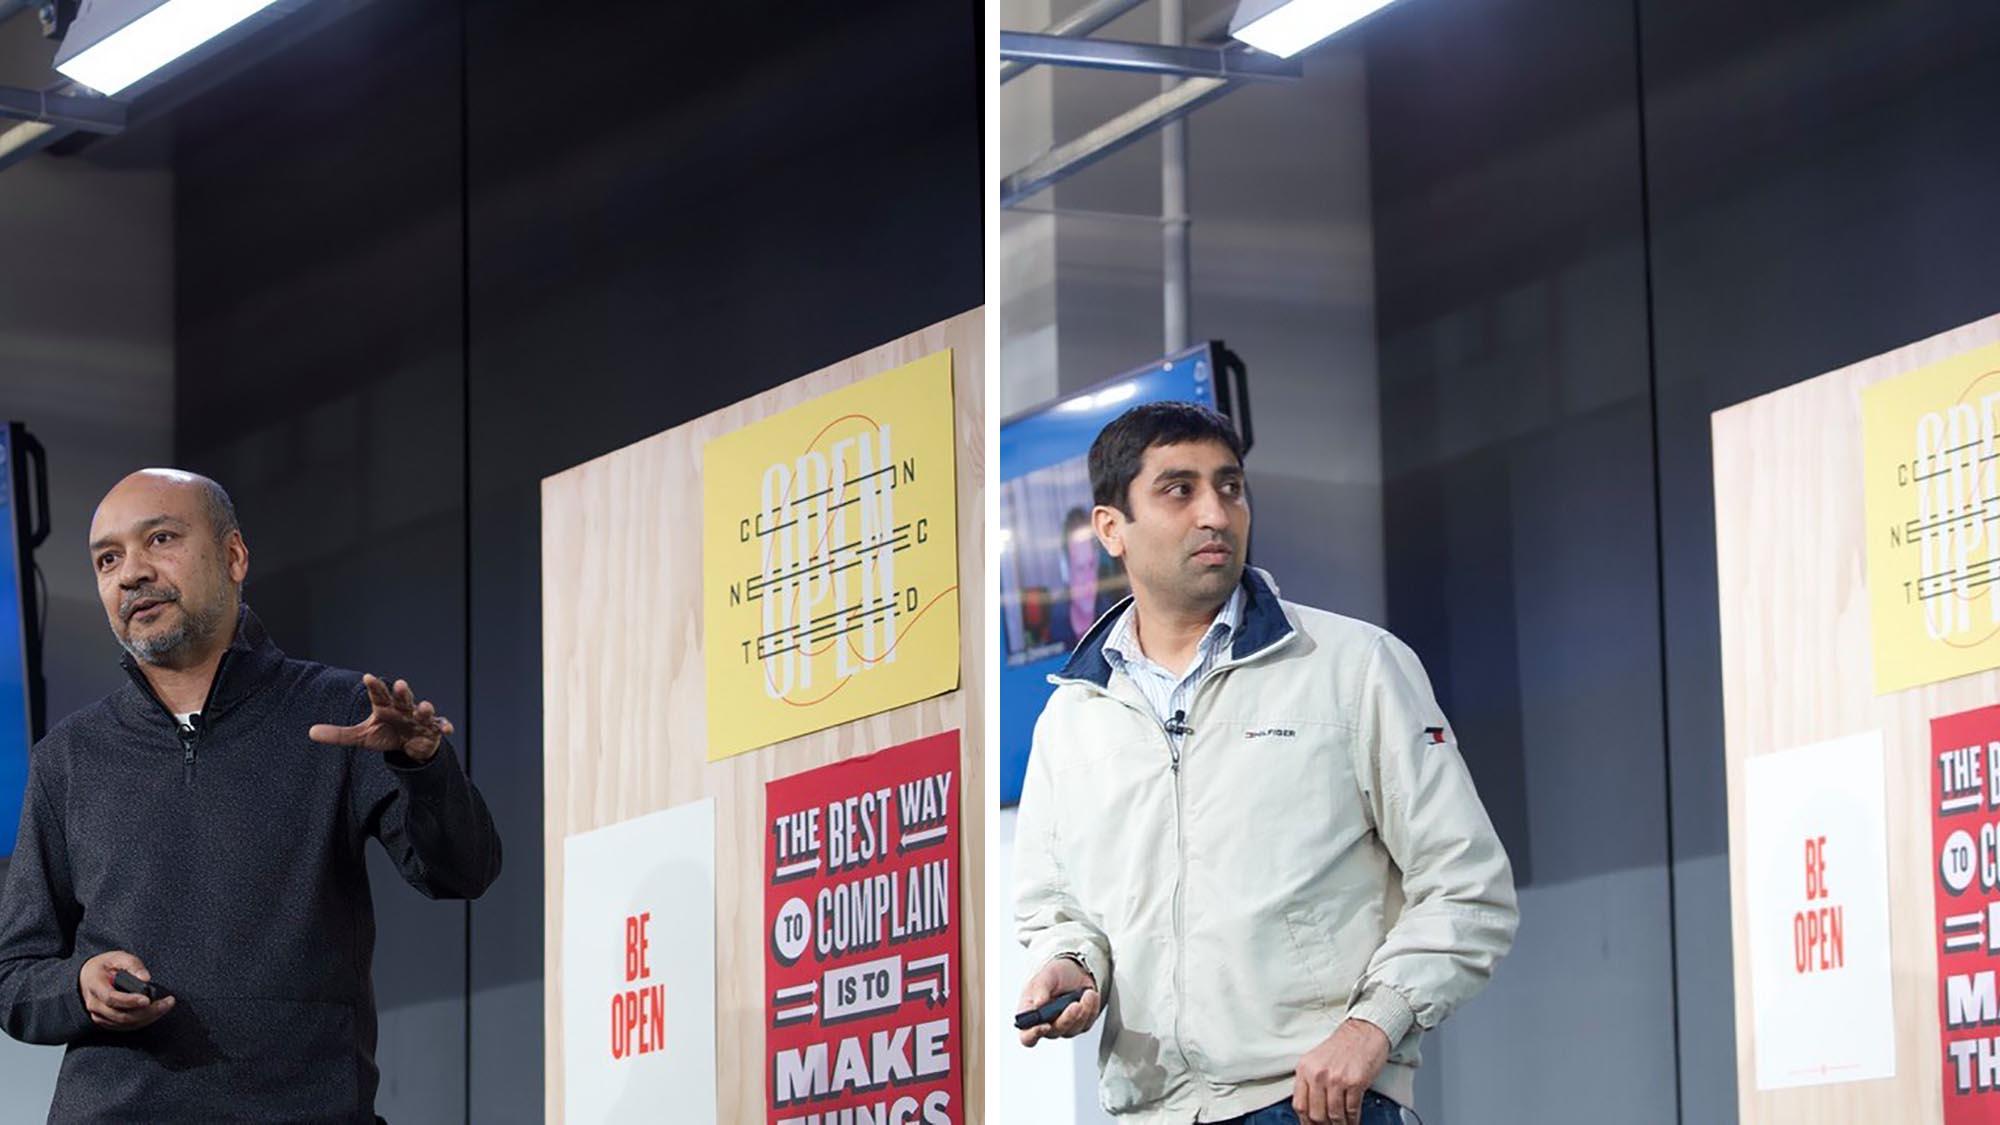 Fiaz Hossain, CTO of Site Reliability, Salesforce Suhas Dantkale, Lead Software Engineer, Salesforce